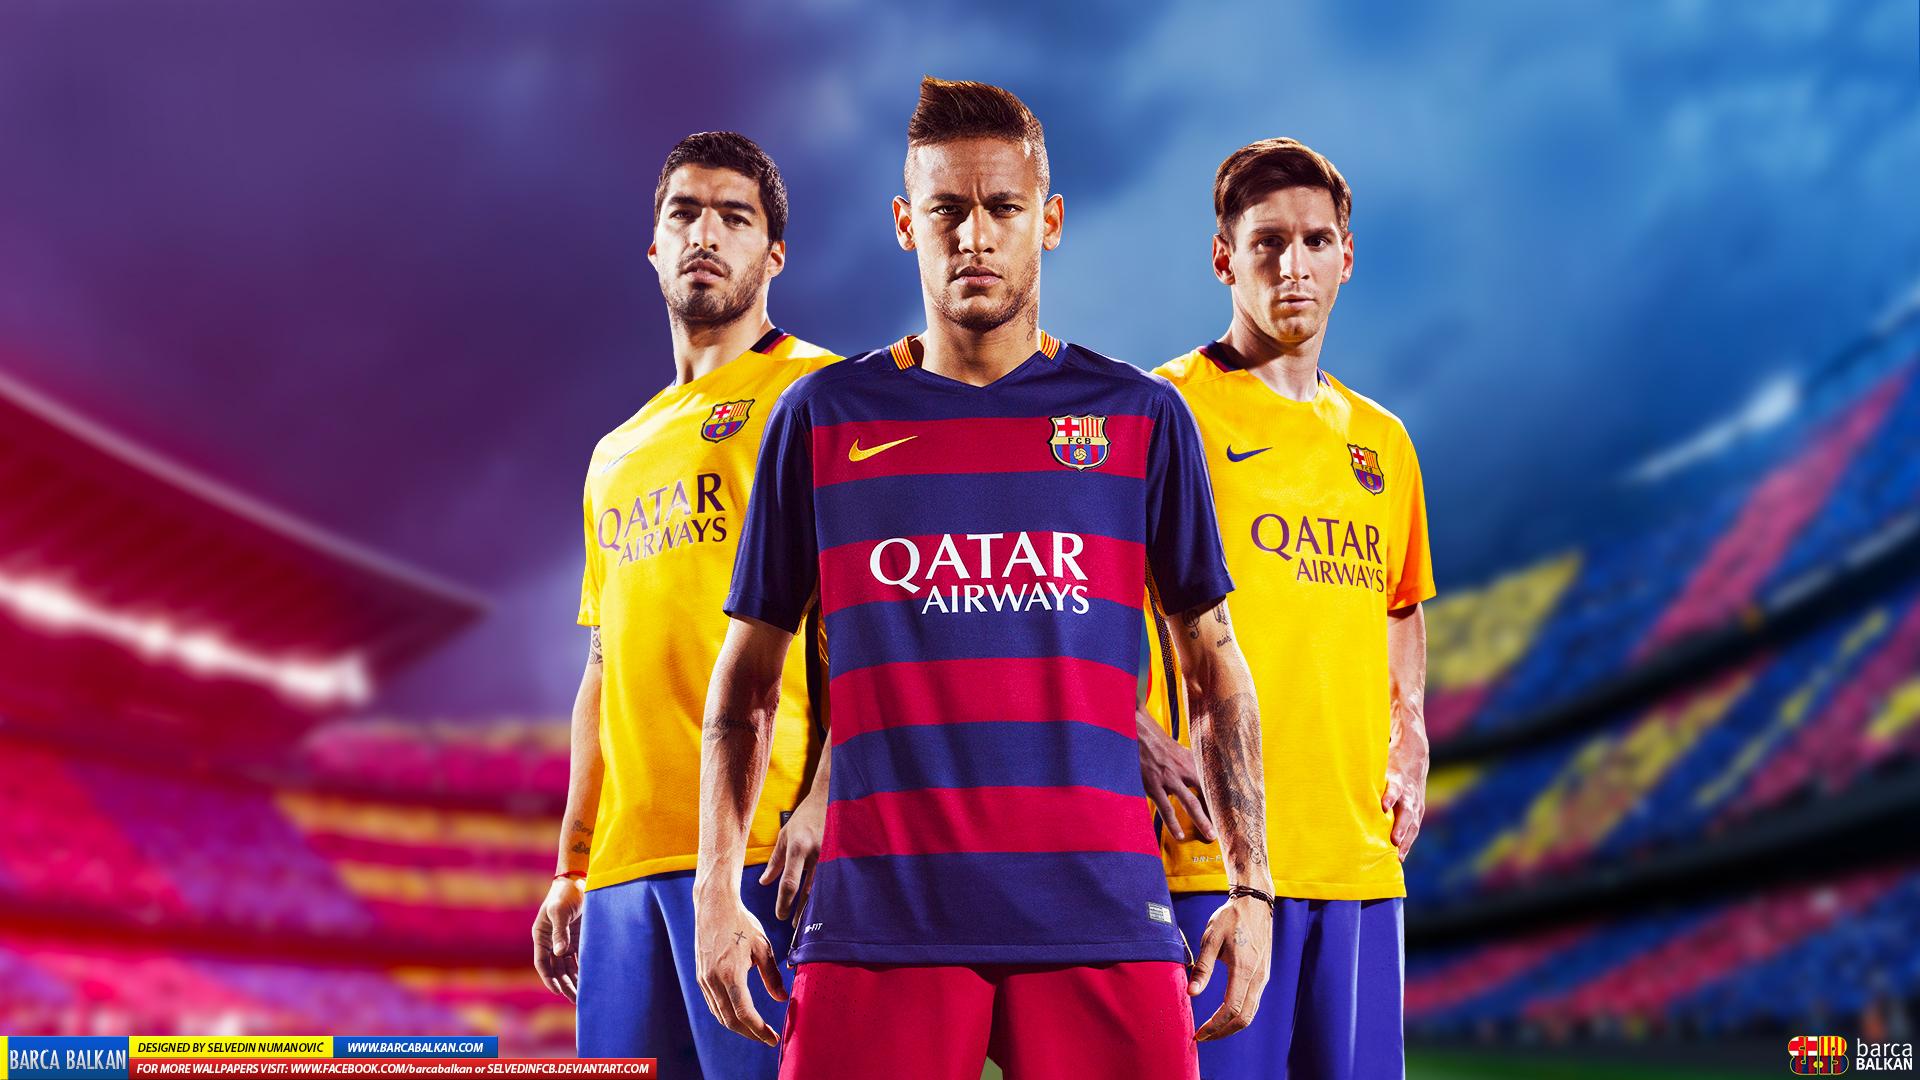 Messi Suarez Neymar HD wallpaper 2015 by SelvedinFCB 1920x1080